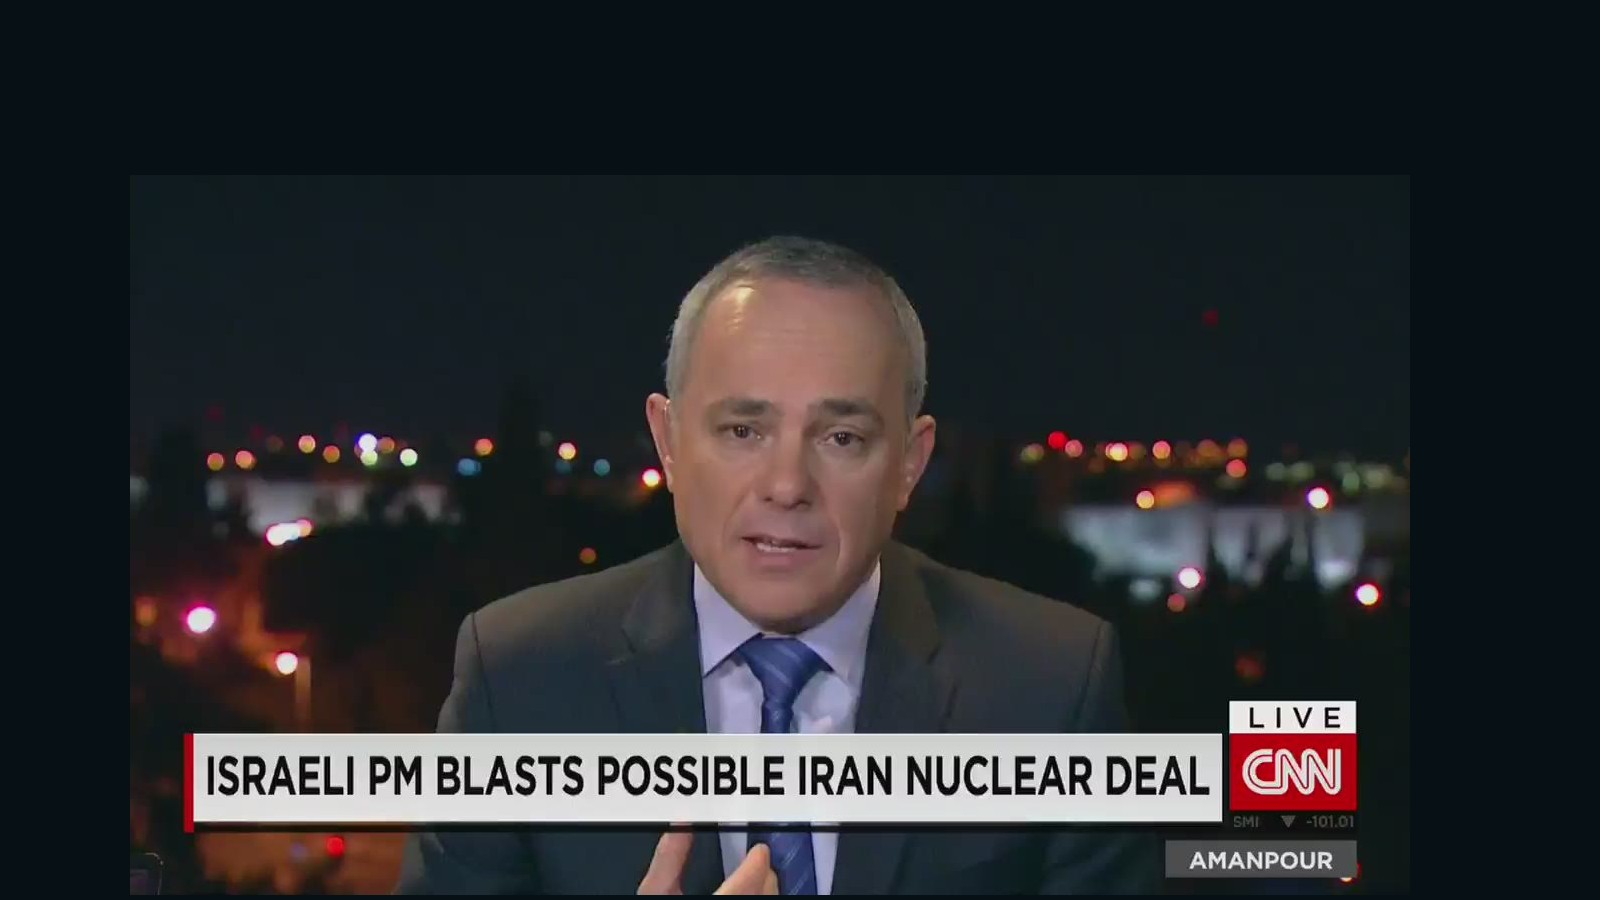 Israel Intel  Minister: 'Little Israel' can't keep silent - CNN Video